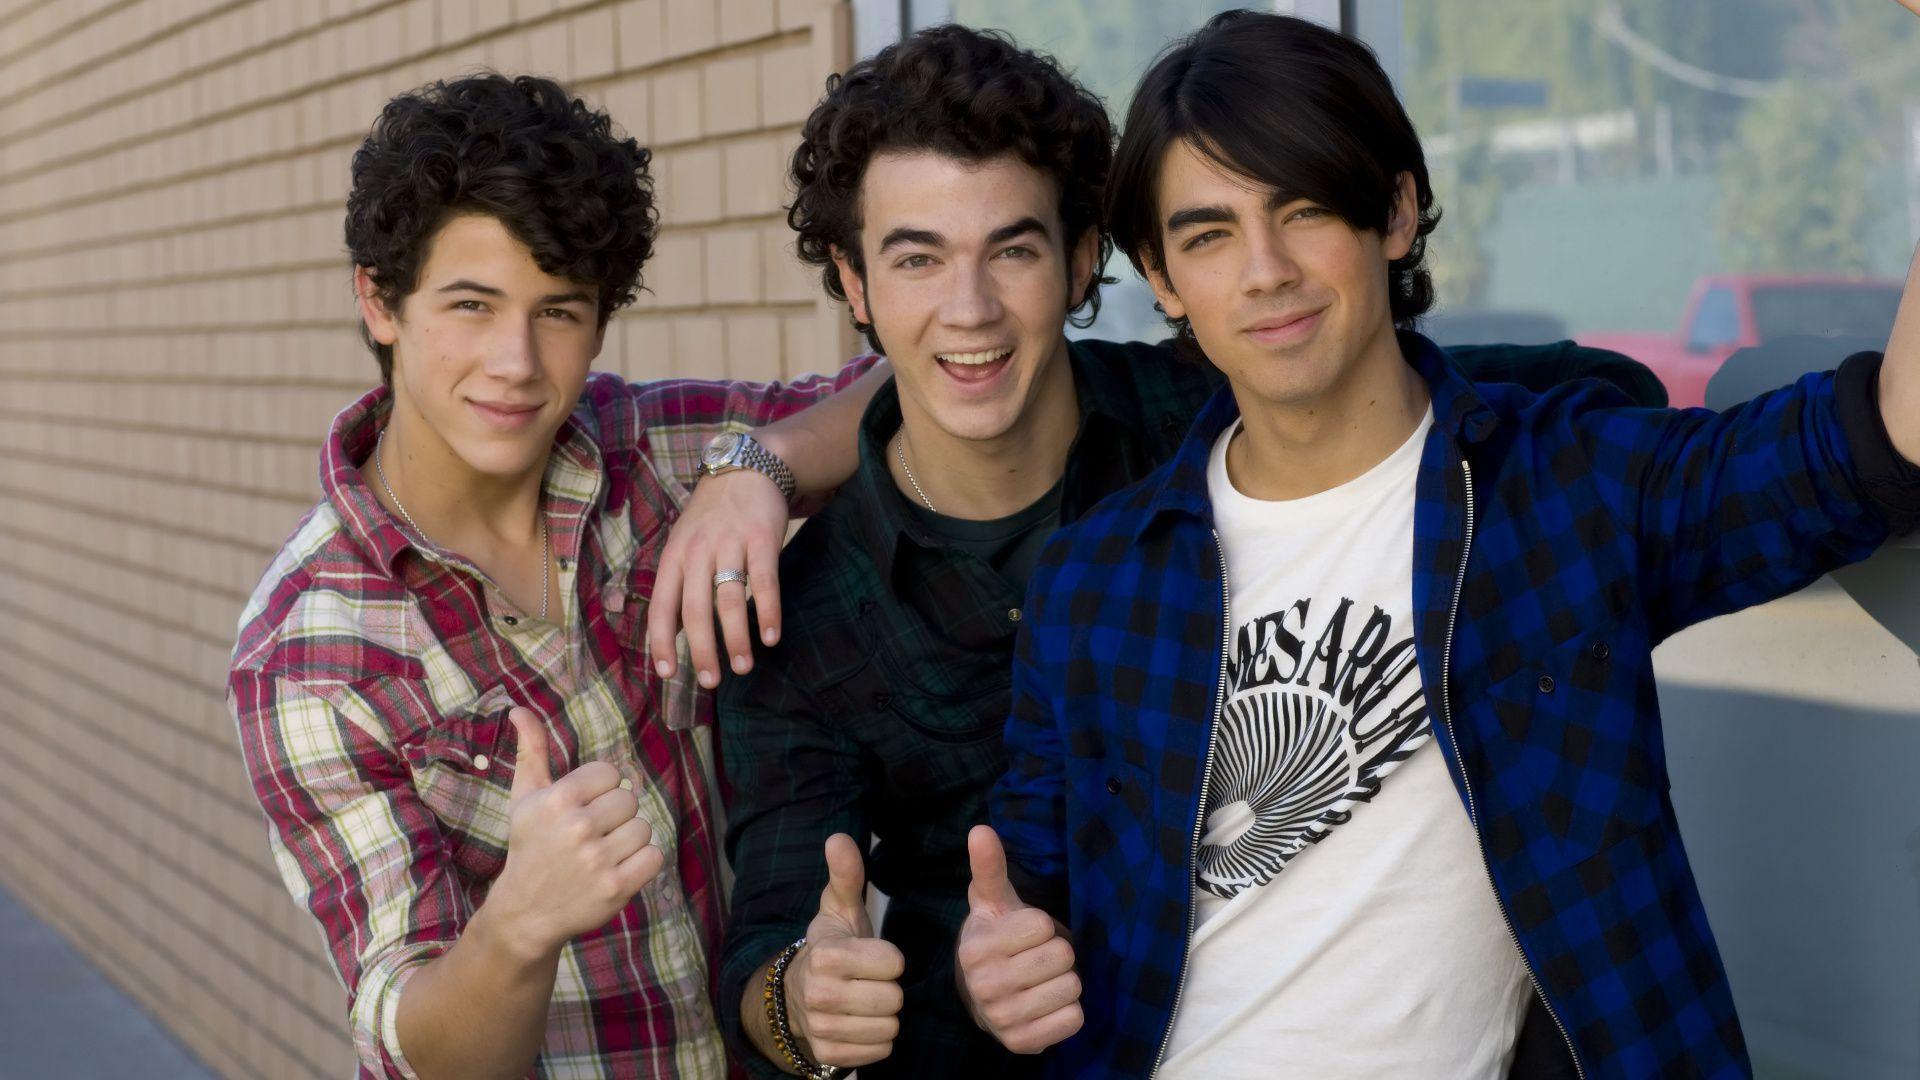 Jonas Brothers Computer Wallpaper